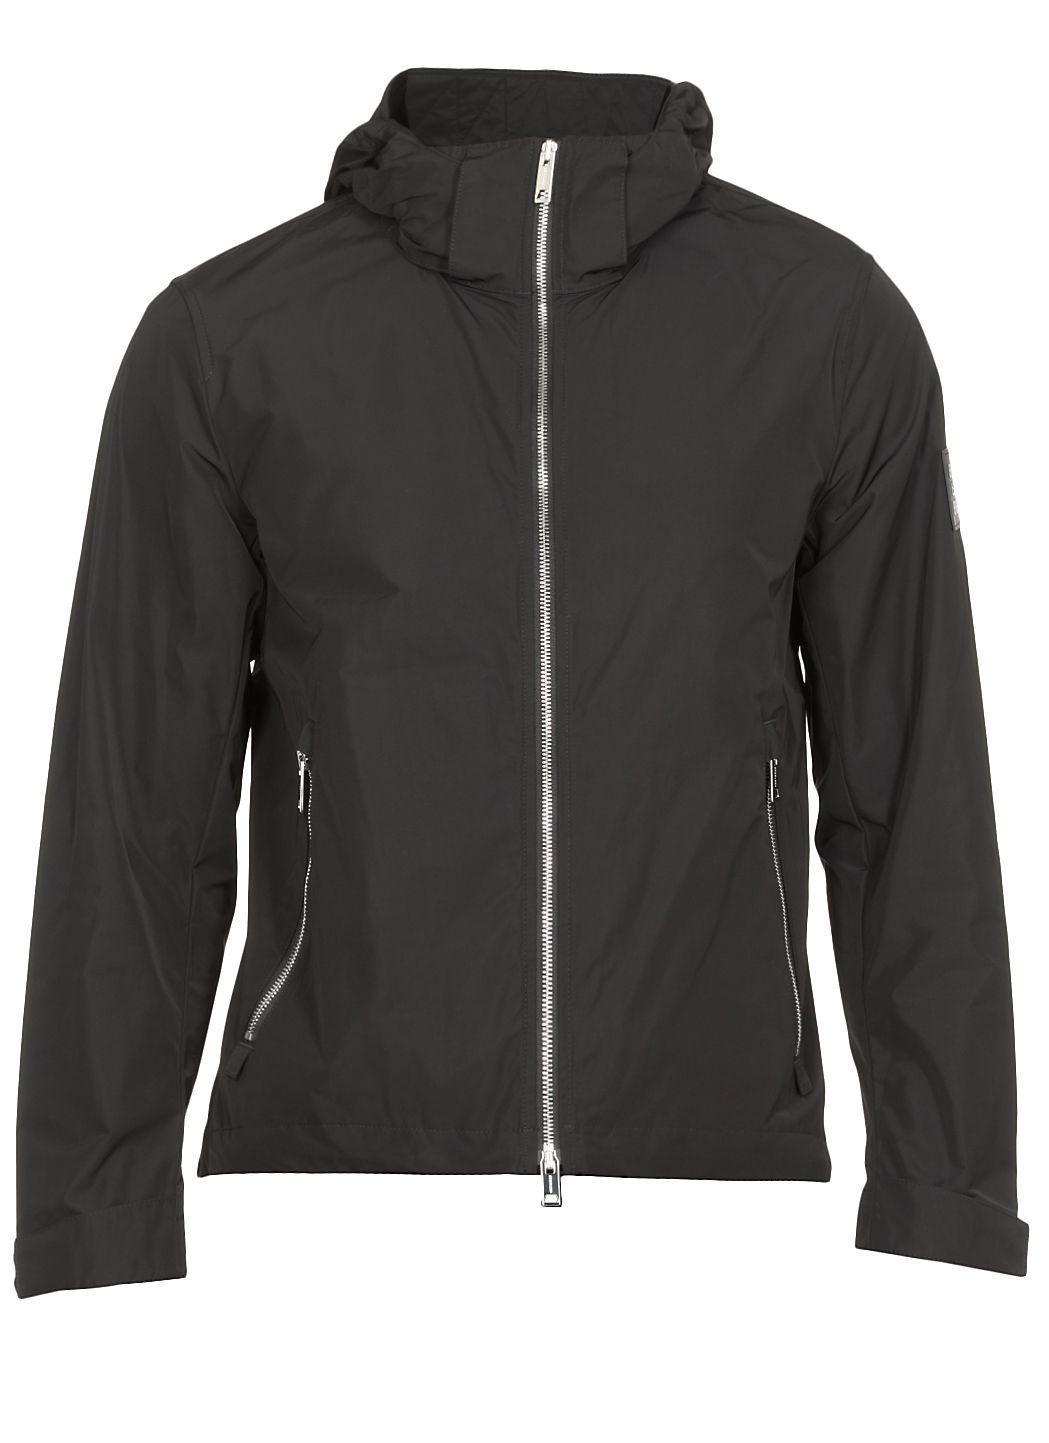 Hargrave packaway hood taffeta jacket